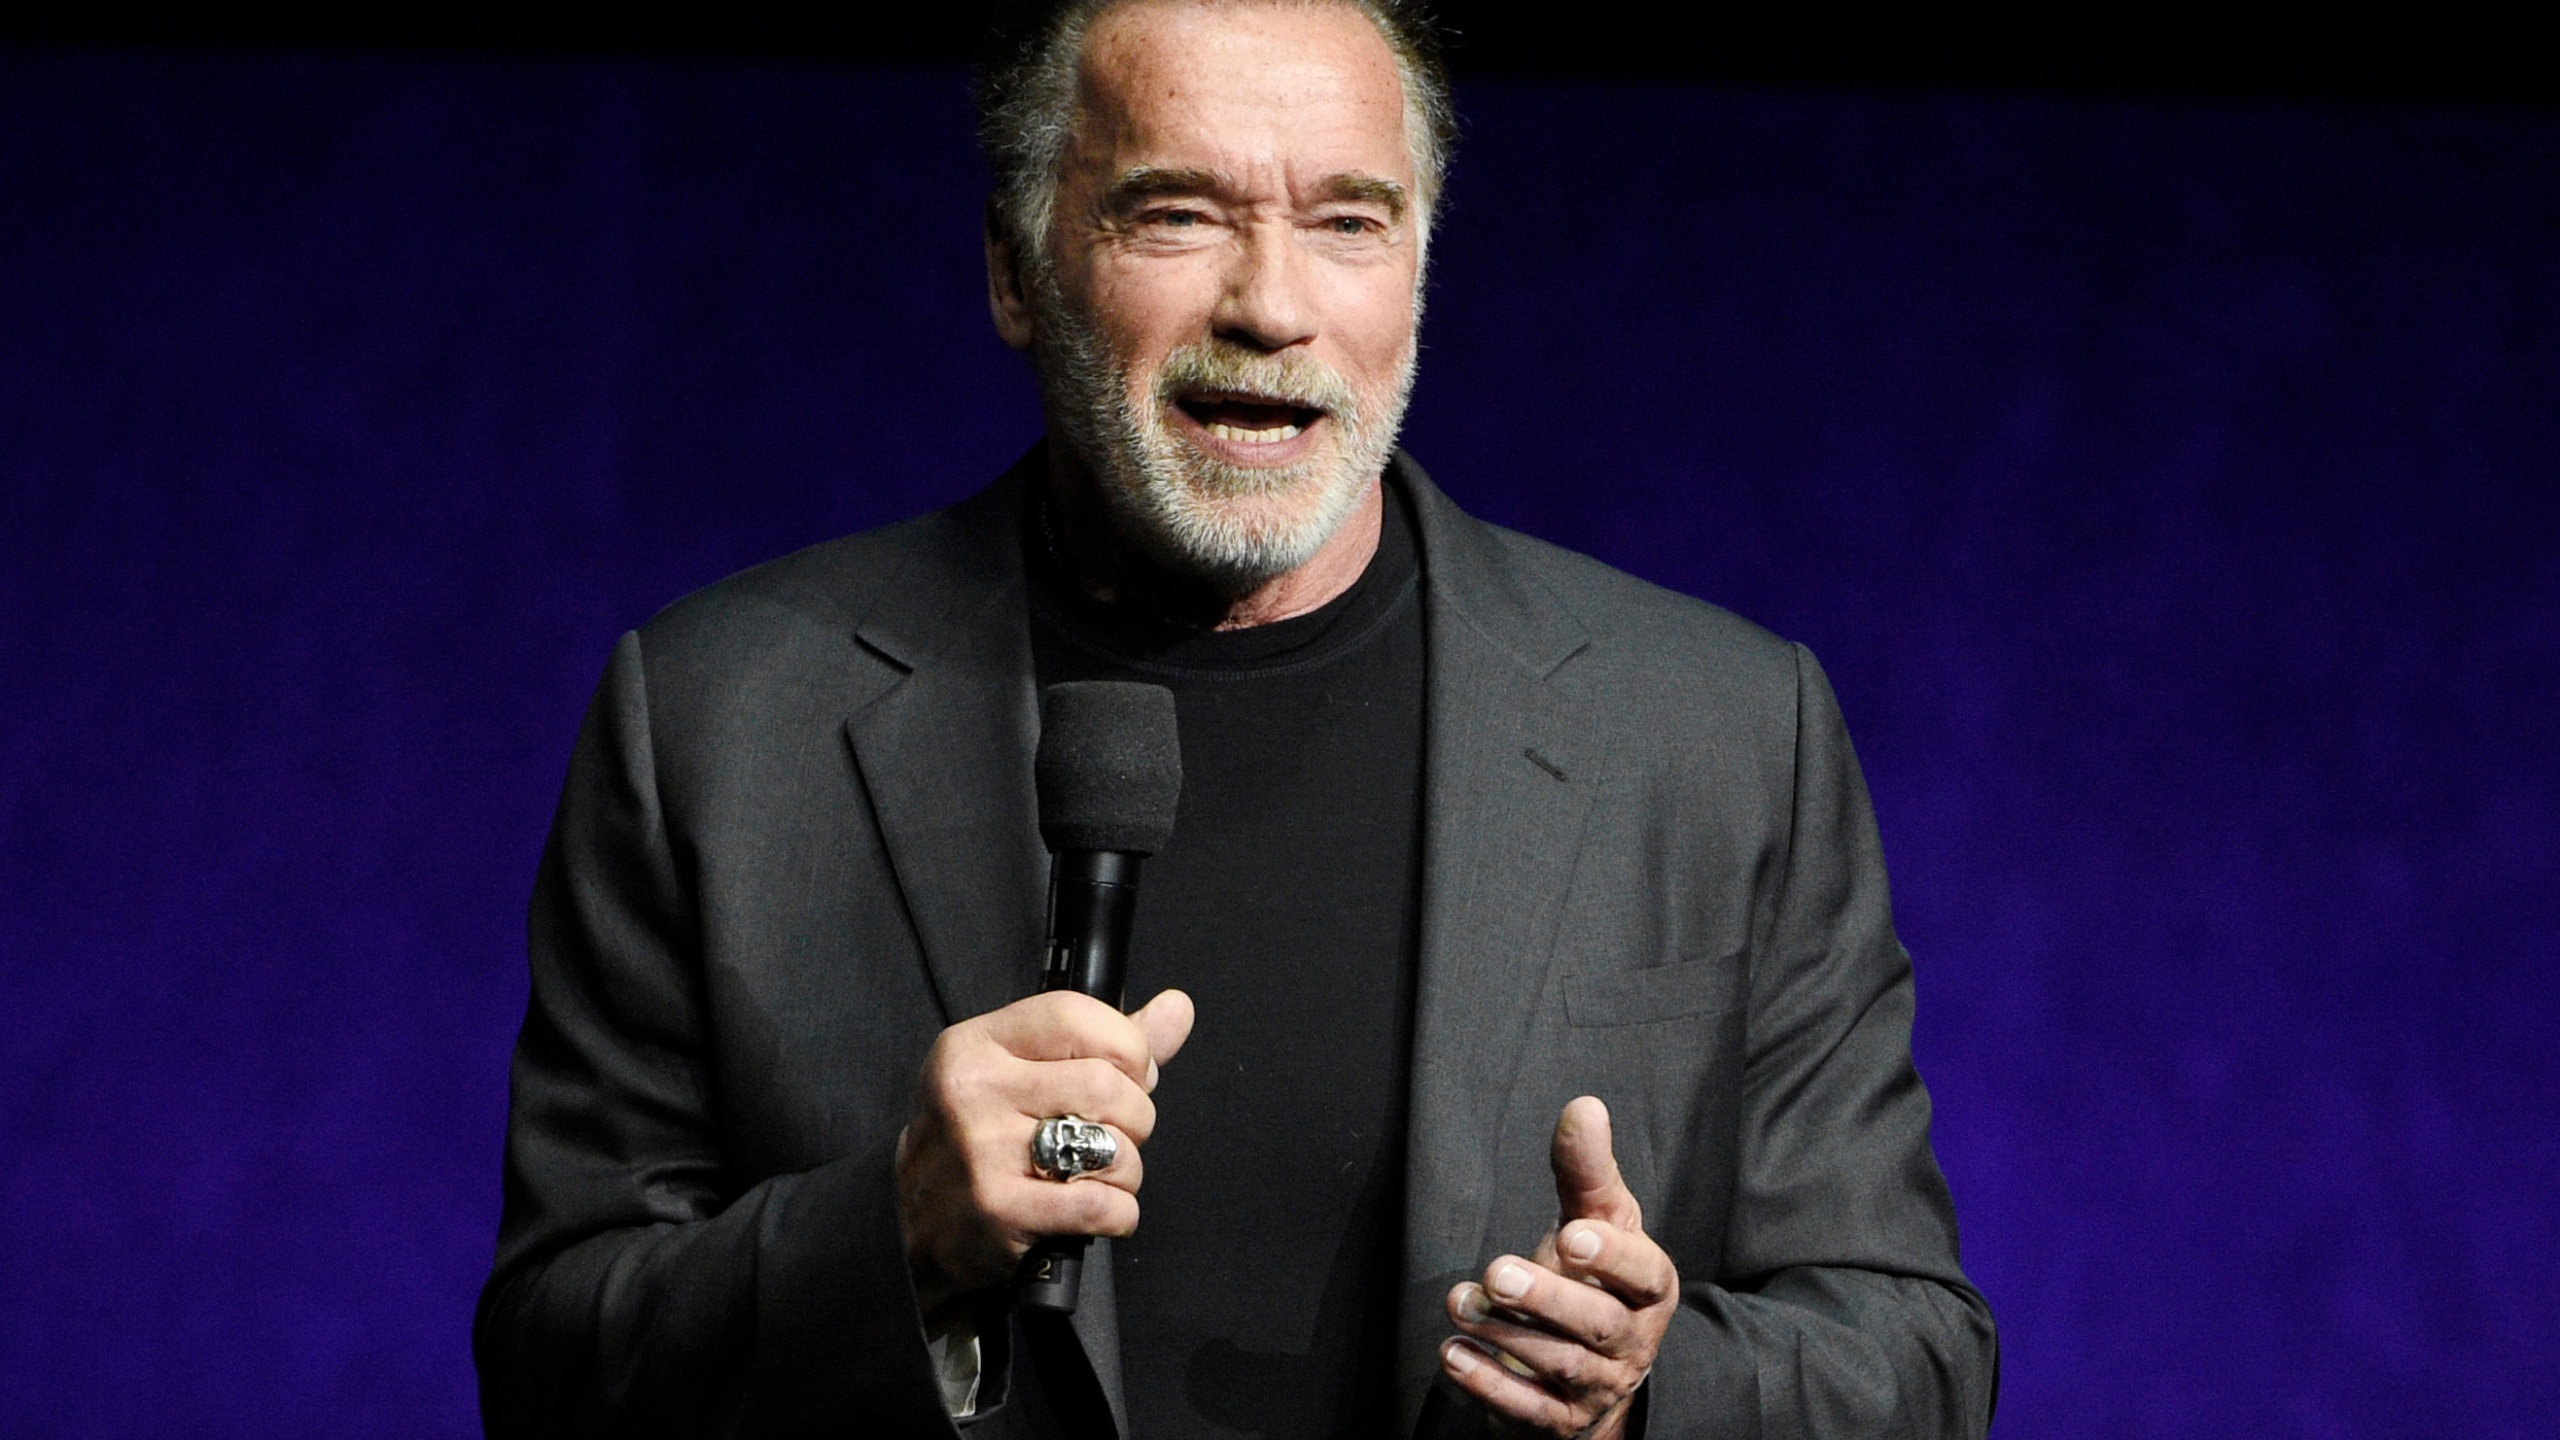 South_Africa_Schwarzenegger_Kicked_84280-159532.jpg77699999